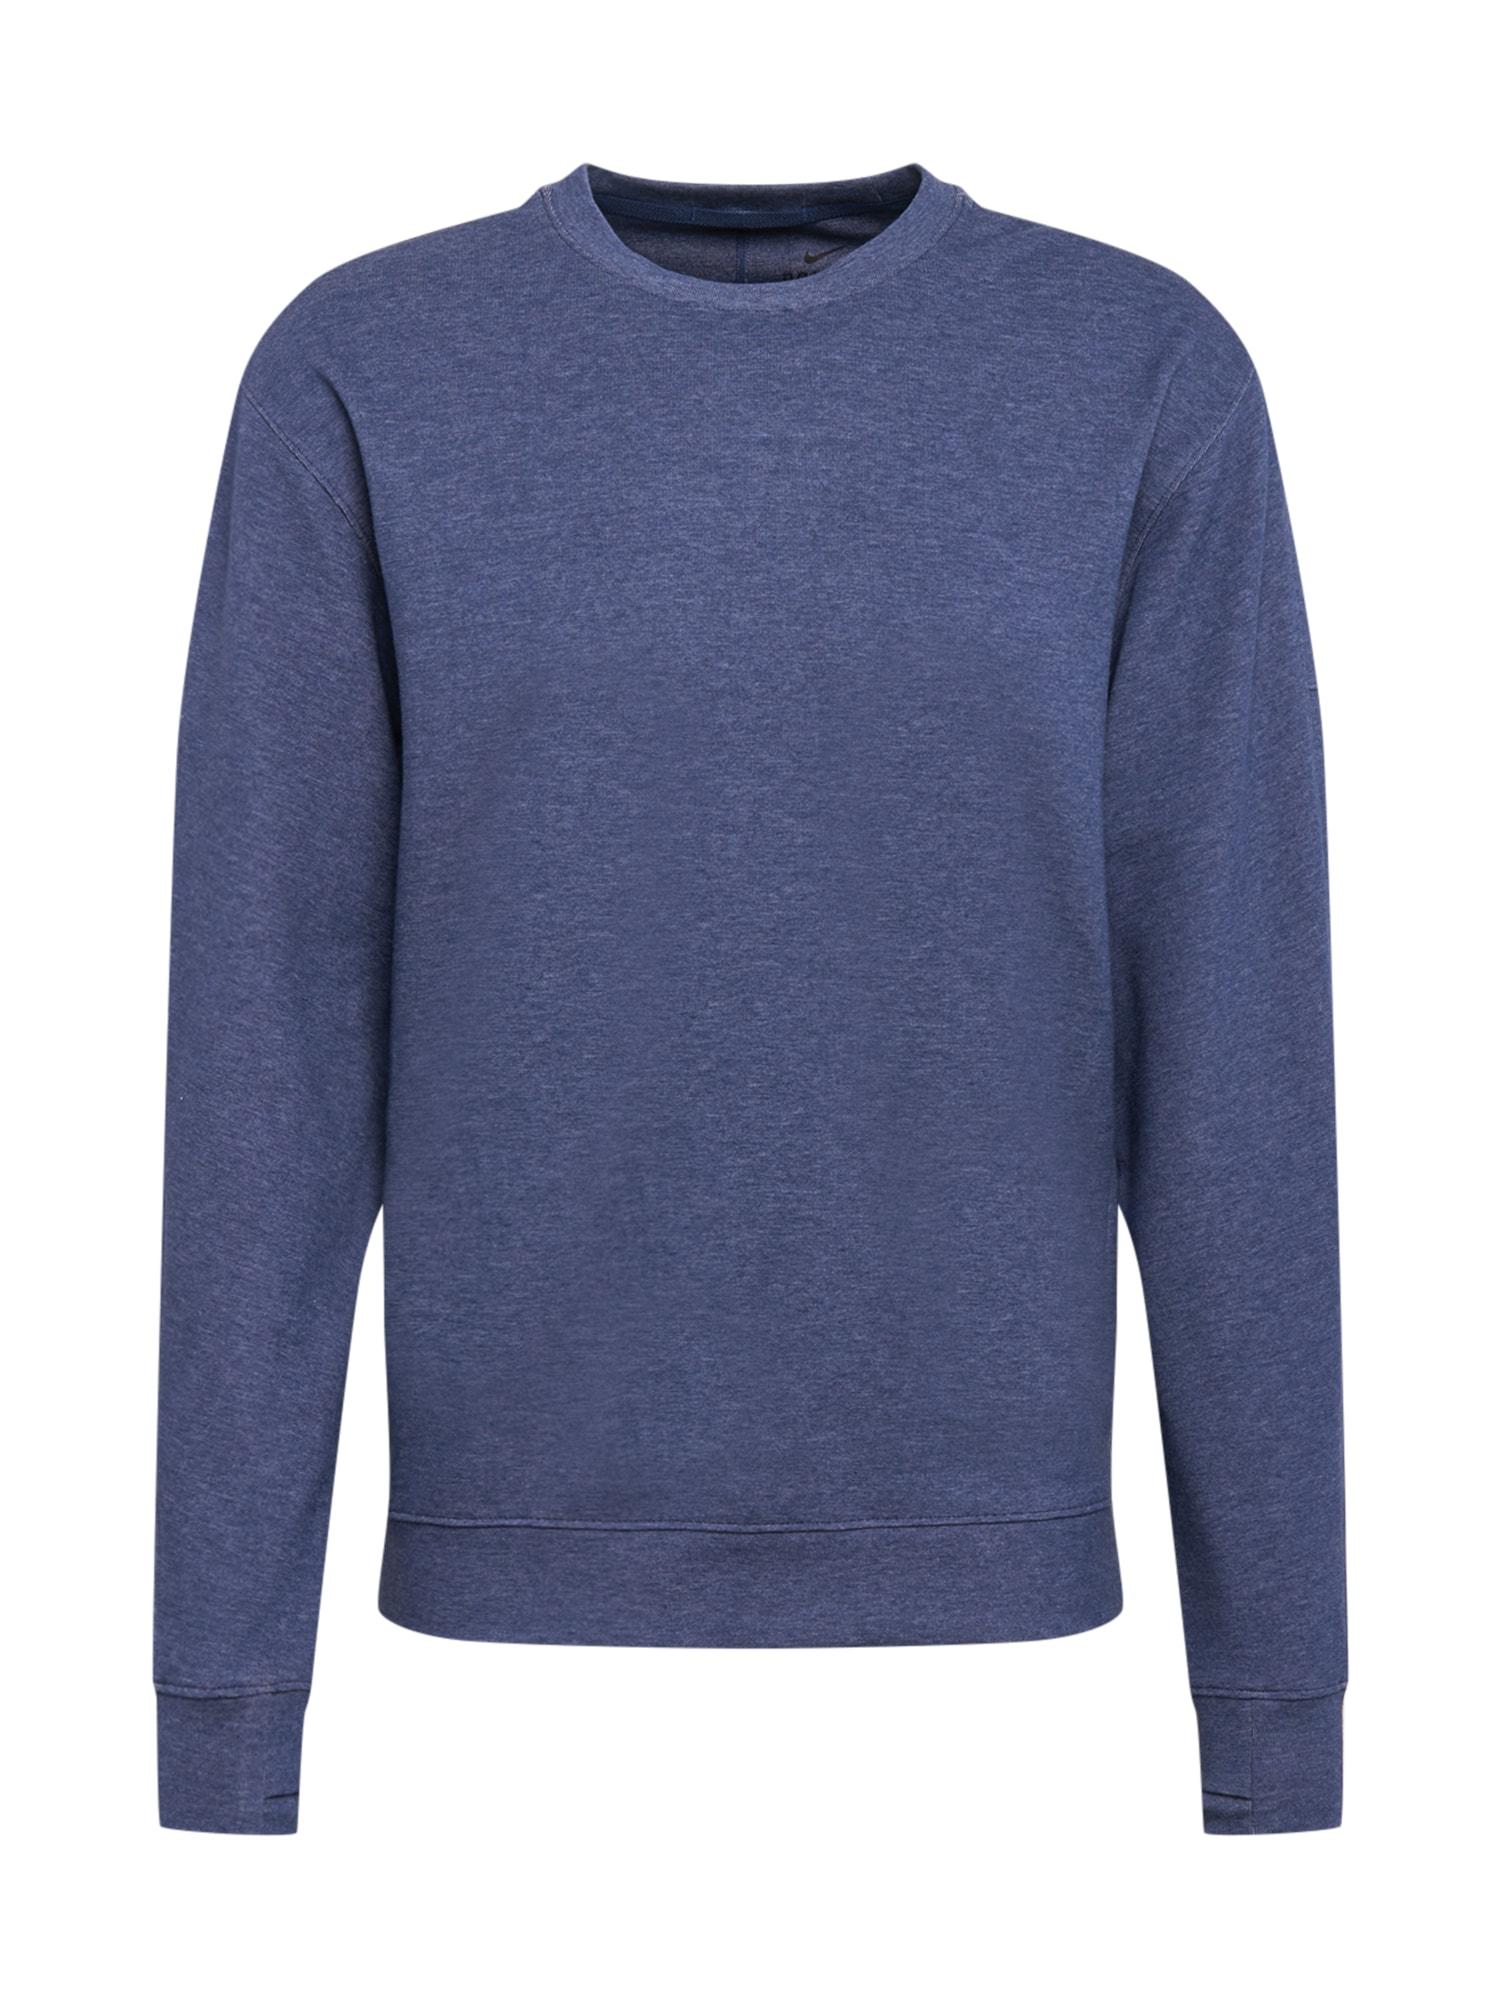 NIKE Sportinio tipo megztinis tamsiai mėlyna